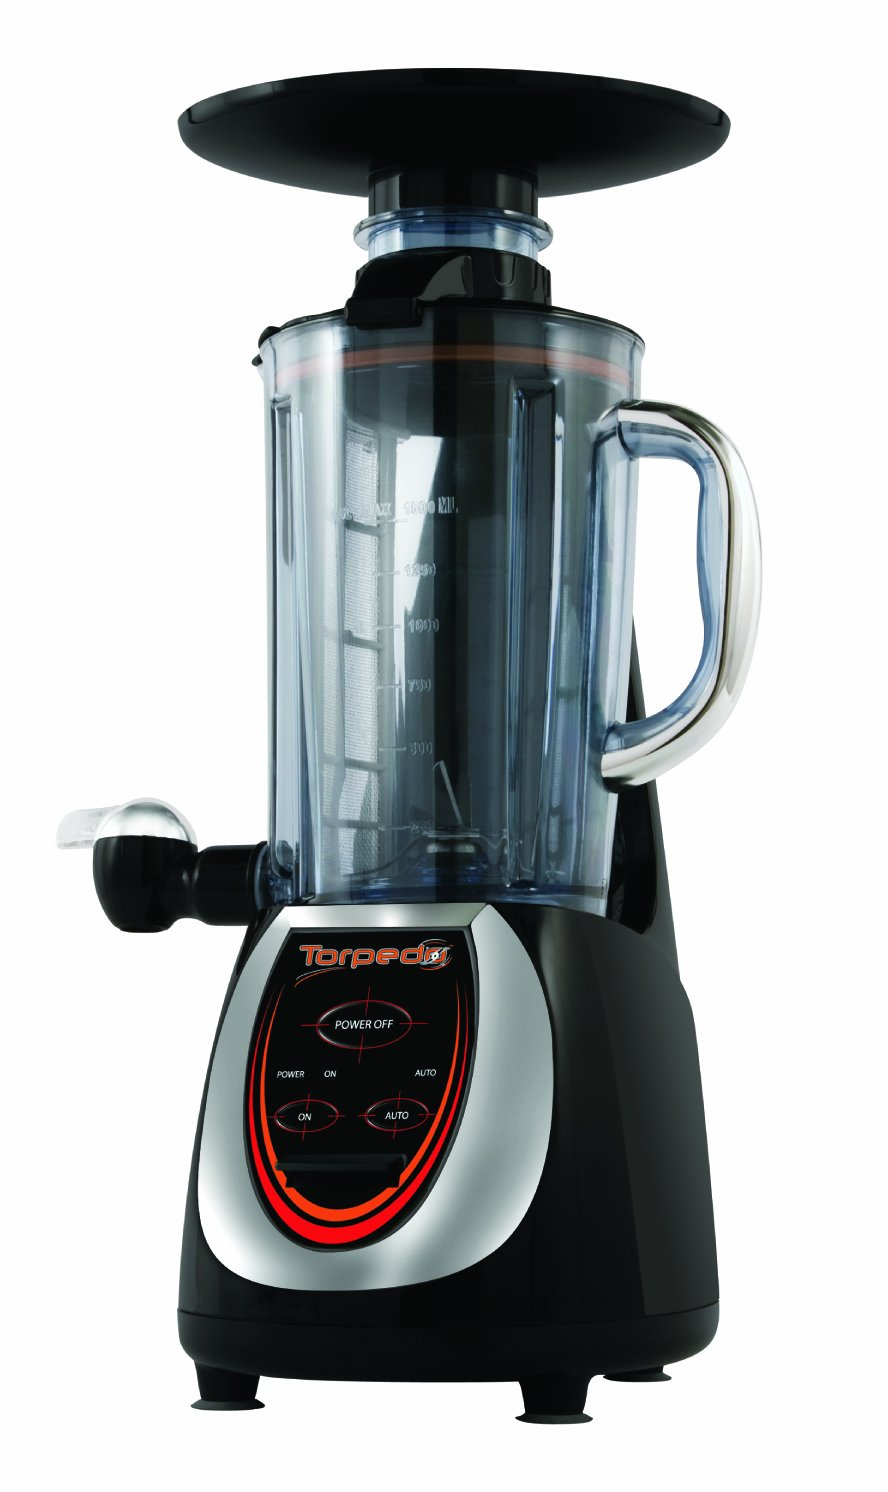 Amazon.com: Big Boss Torpedo Multi-Purpose 10 in 1 Kitchen Appliance ...